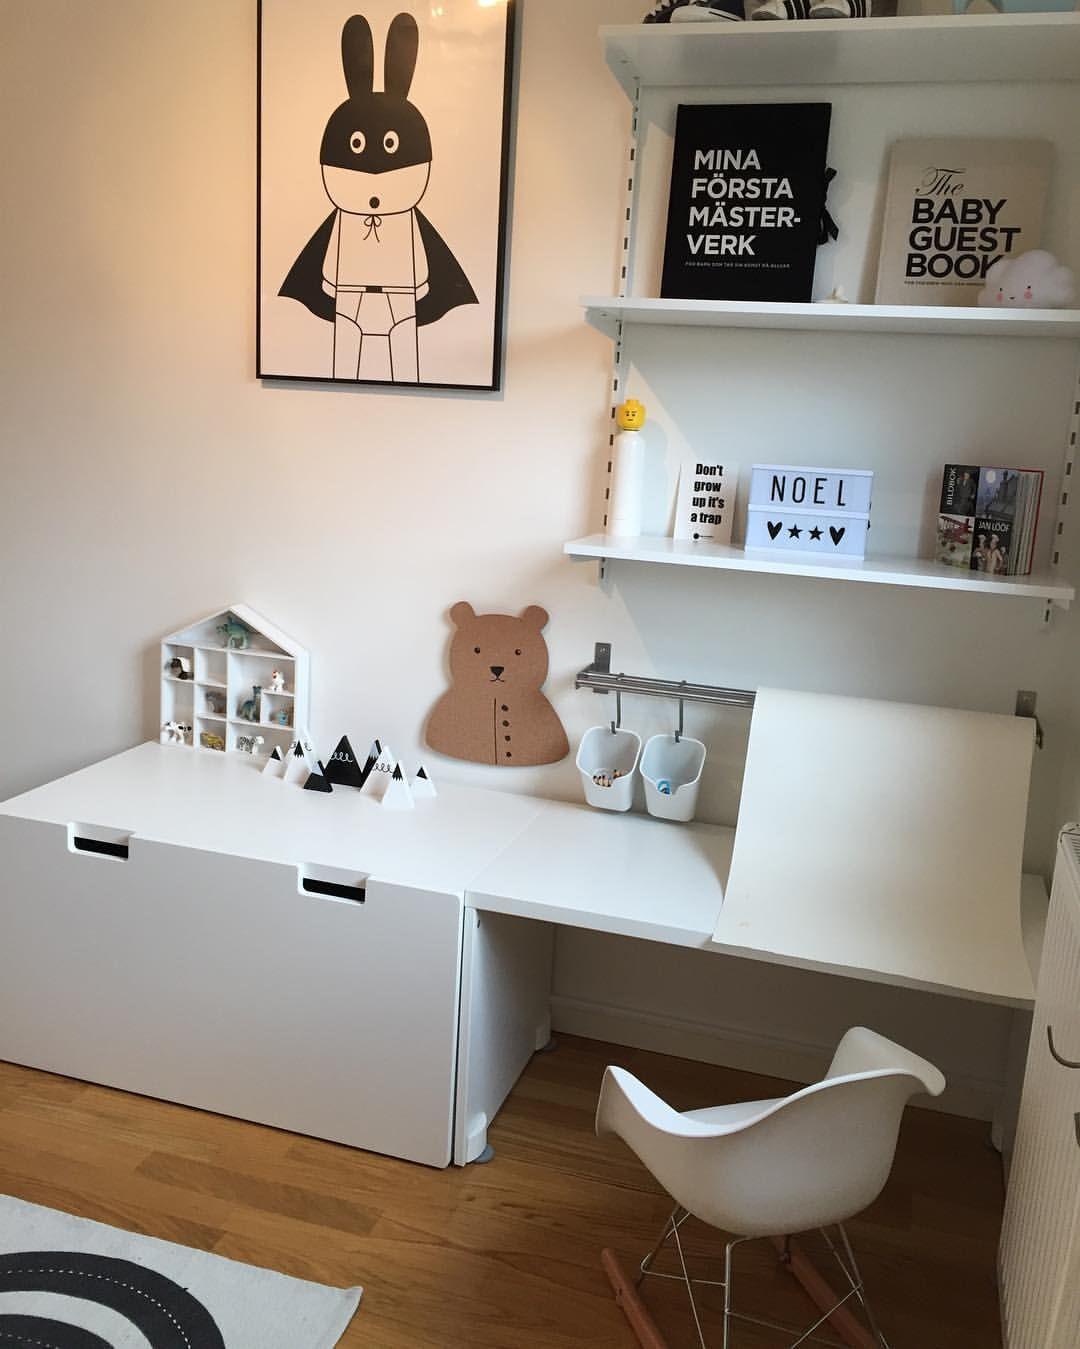 regardez cette photo instagram de. Black Bedroom Furniture Sets. Home Design Ideas